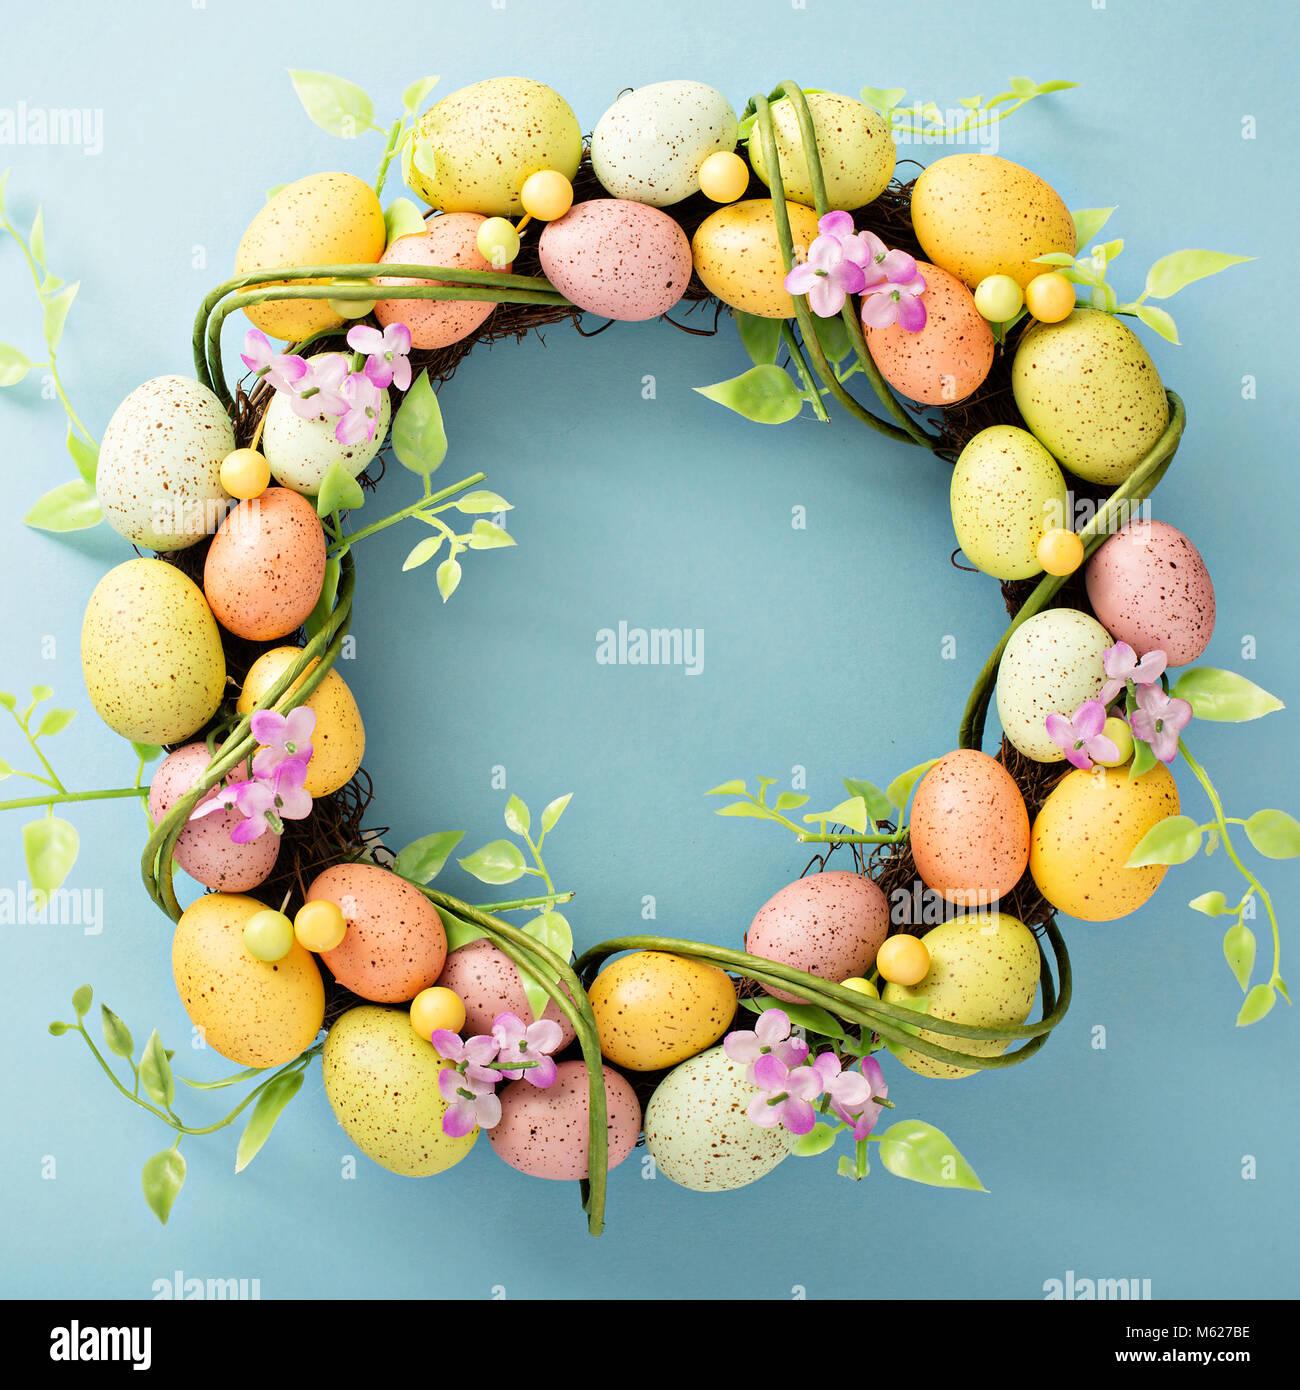 Easter eggs wreath on light blue background - Stock Image